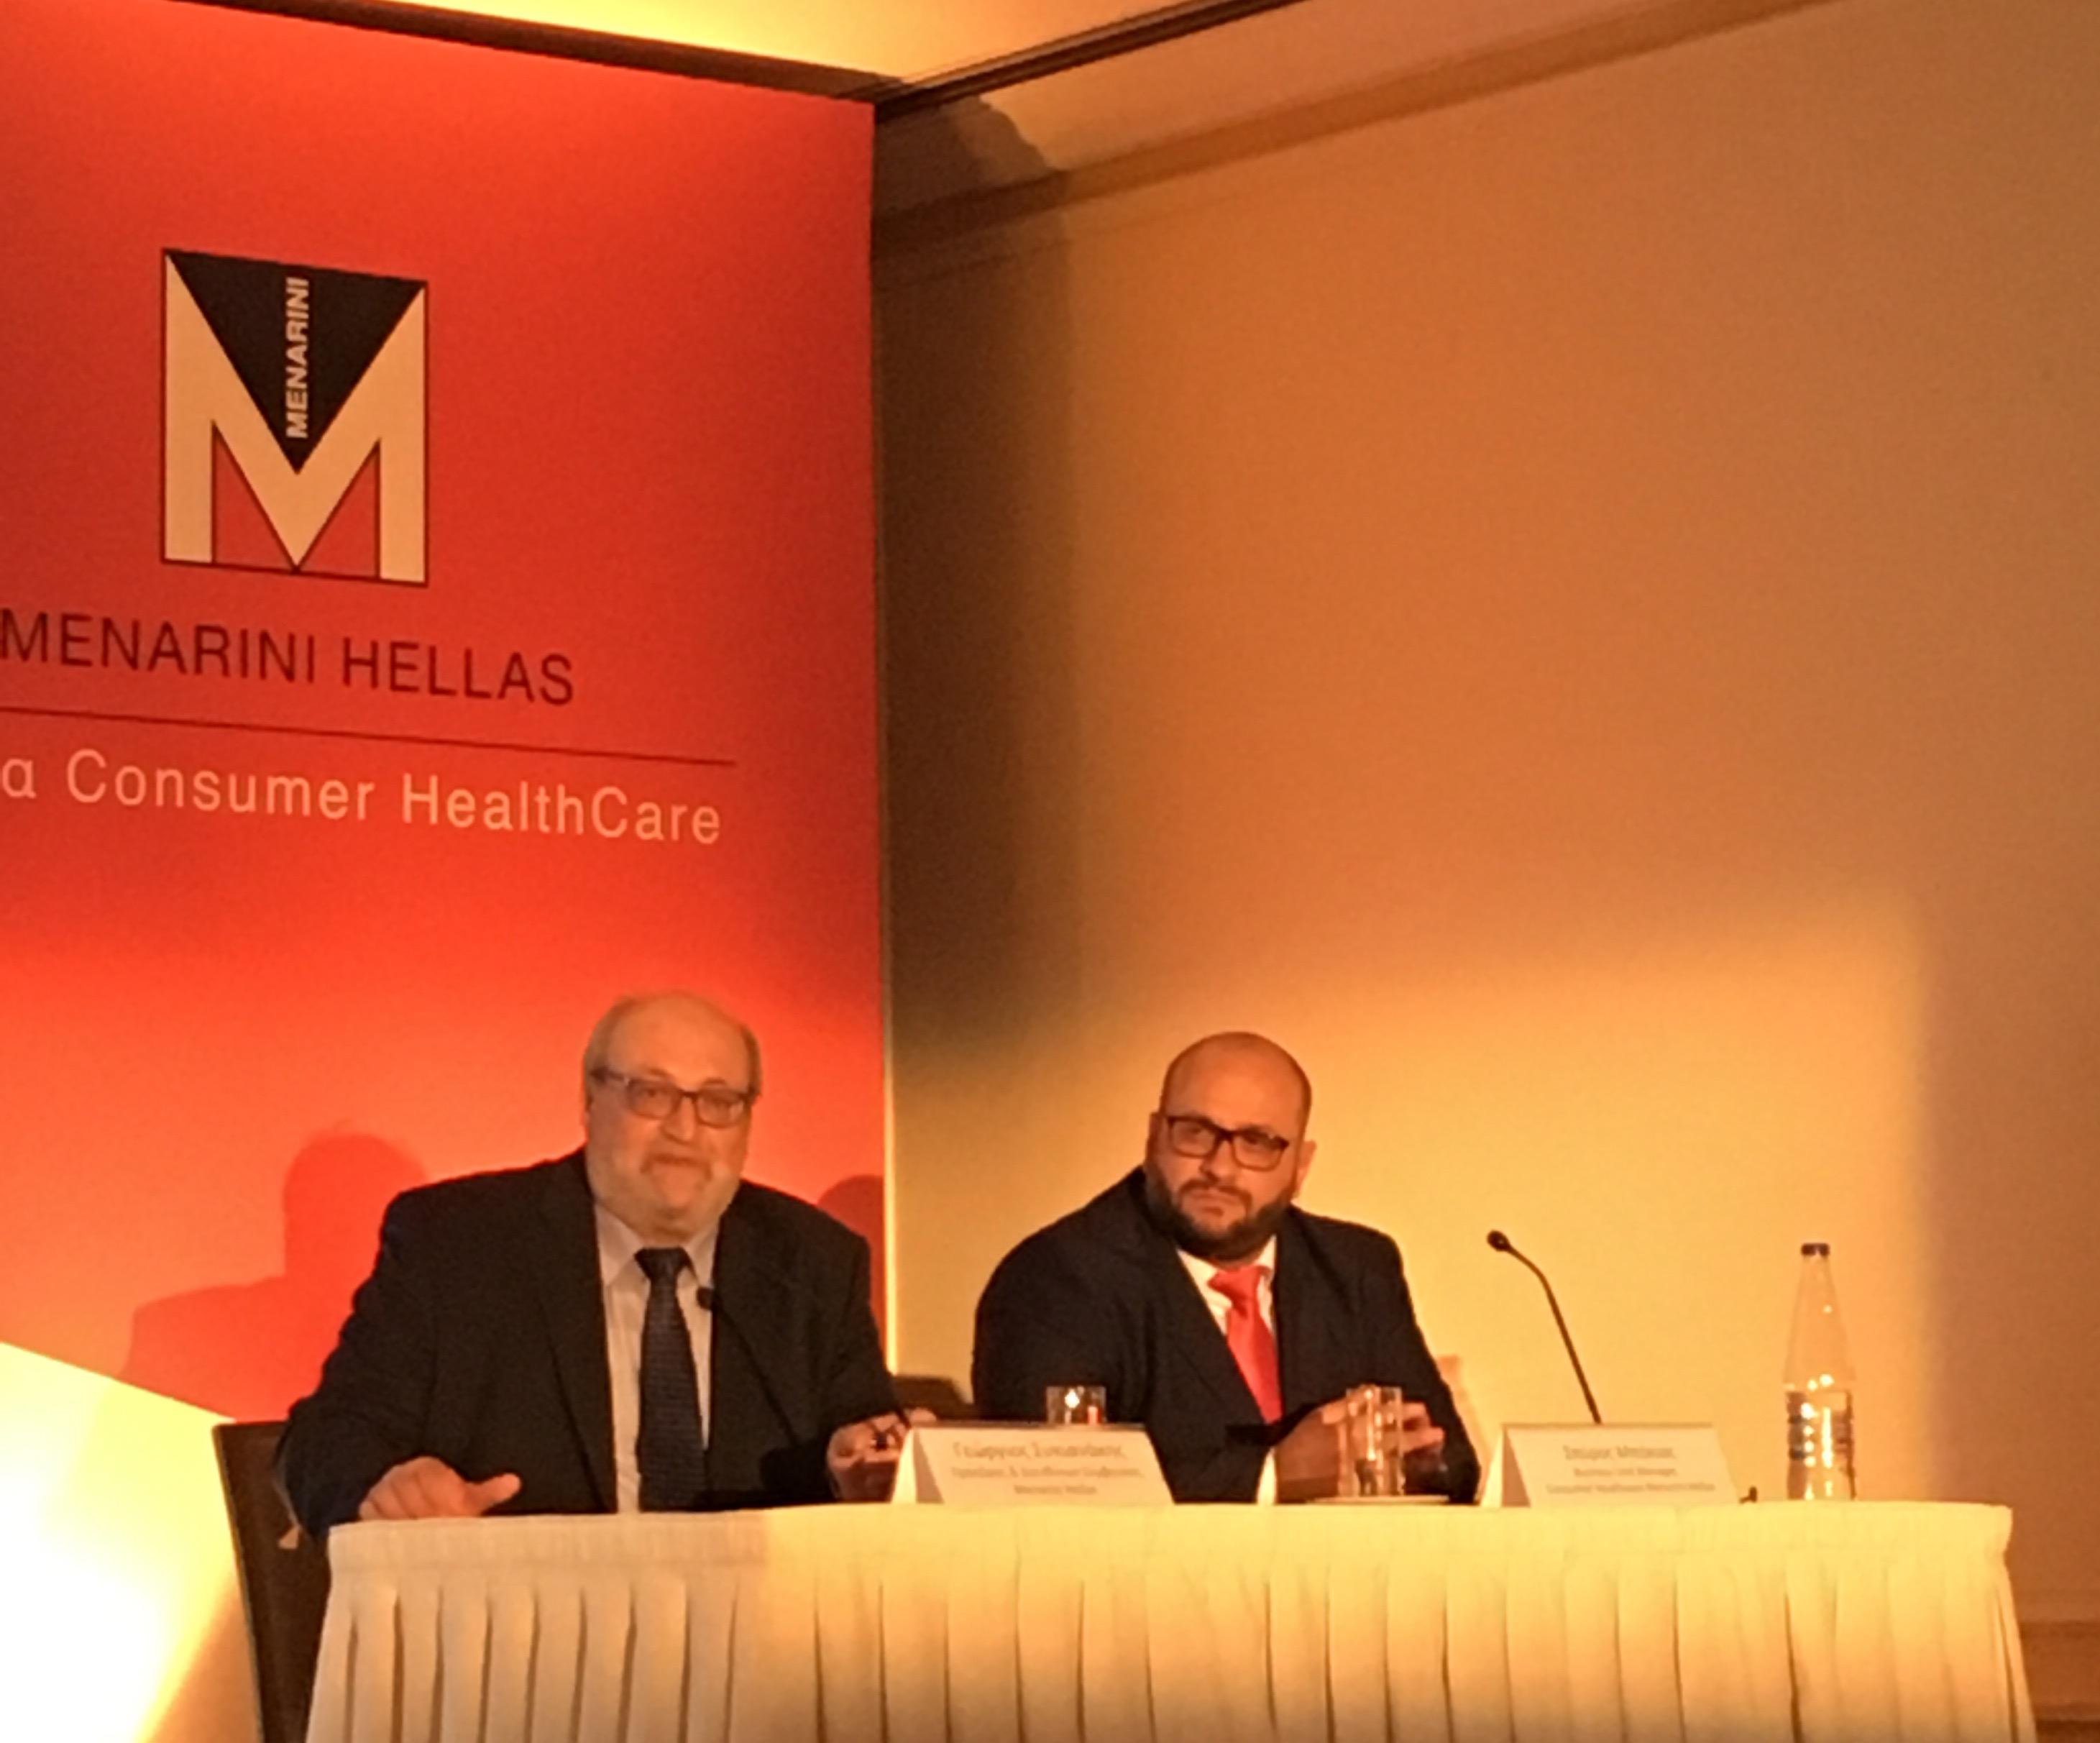 MENARINI Hellas: Νέο μεγάλο άνοιγμα στα συμπληρώματα διατροφής